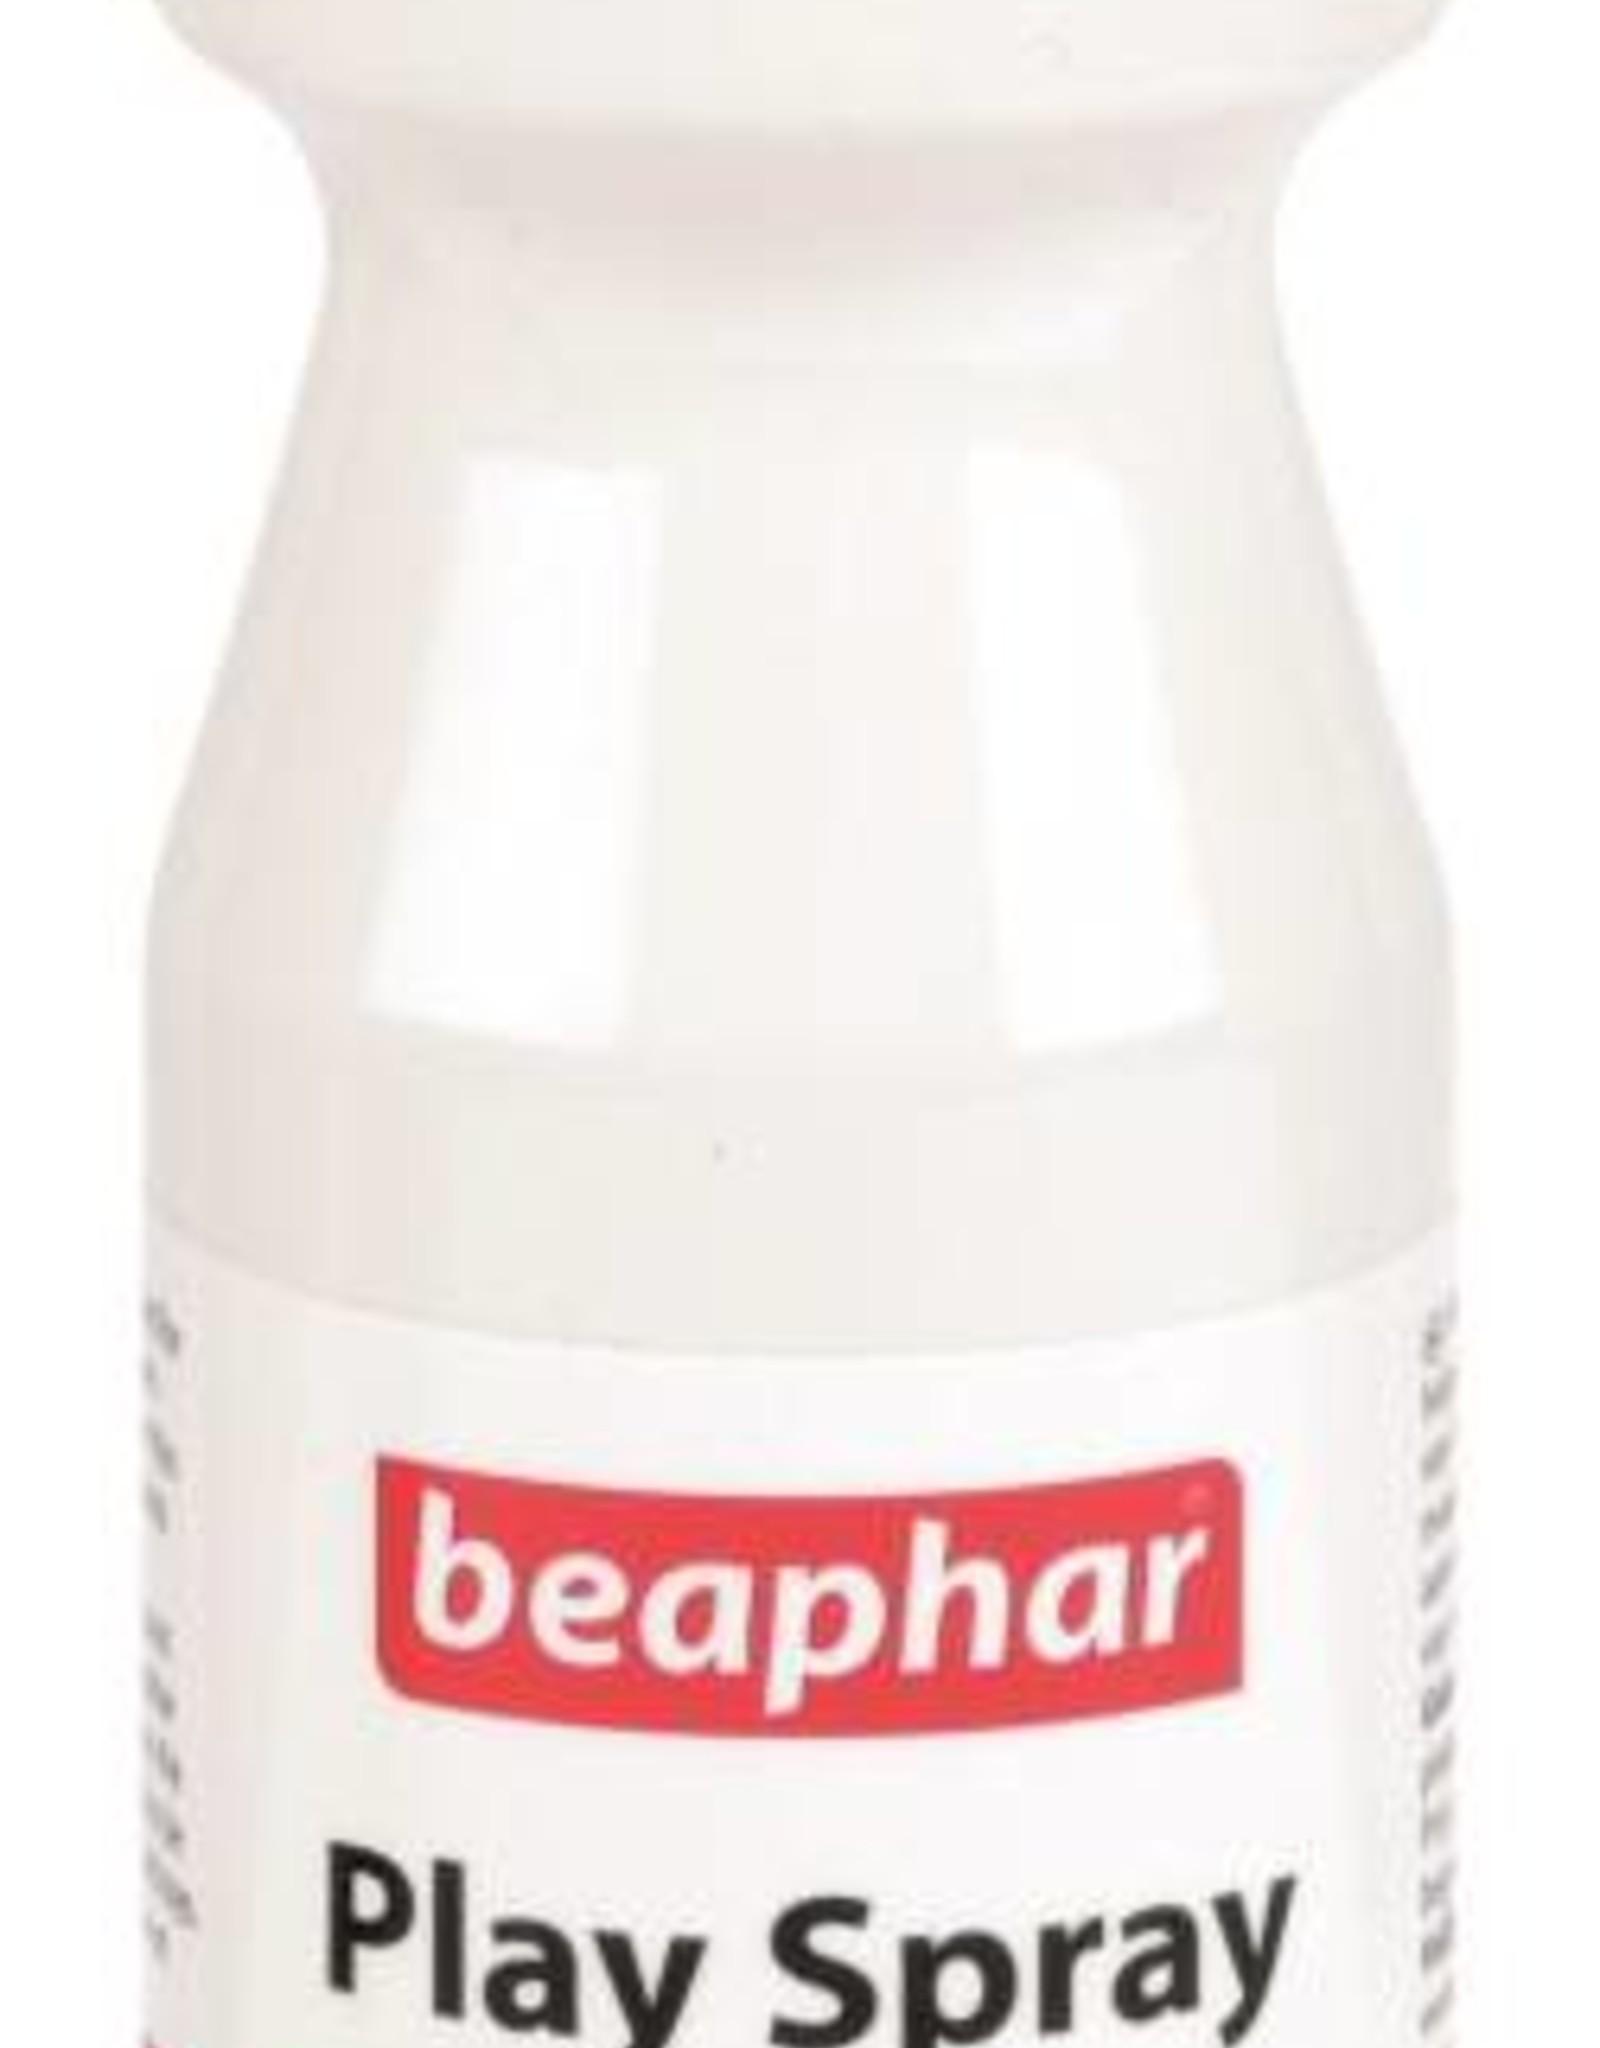 Beaphar Play Spray with Catnip for Cats, 150ml